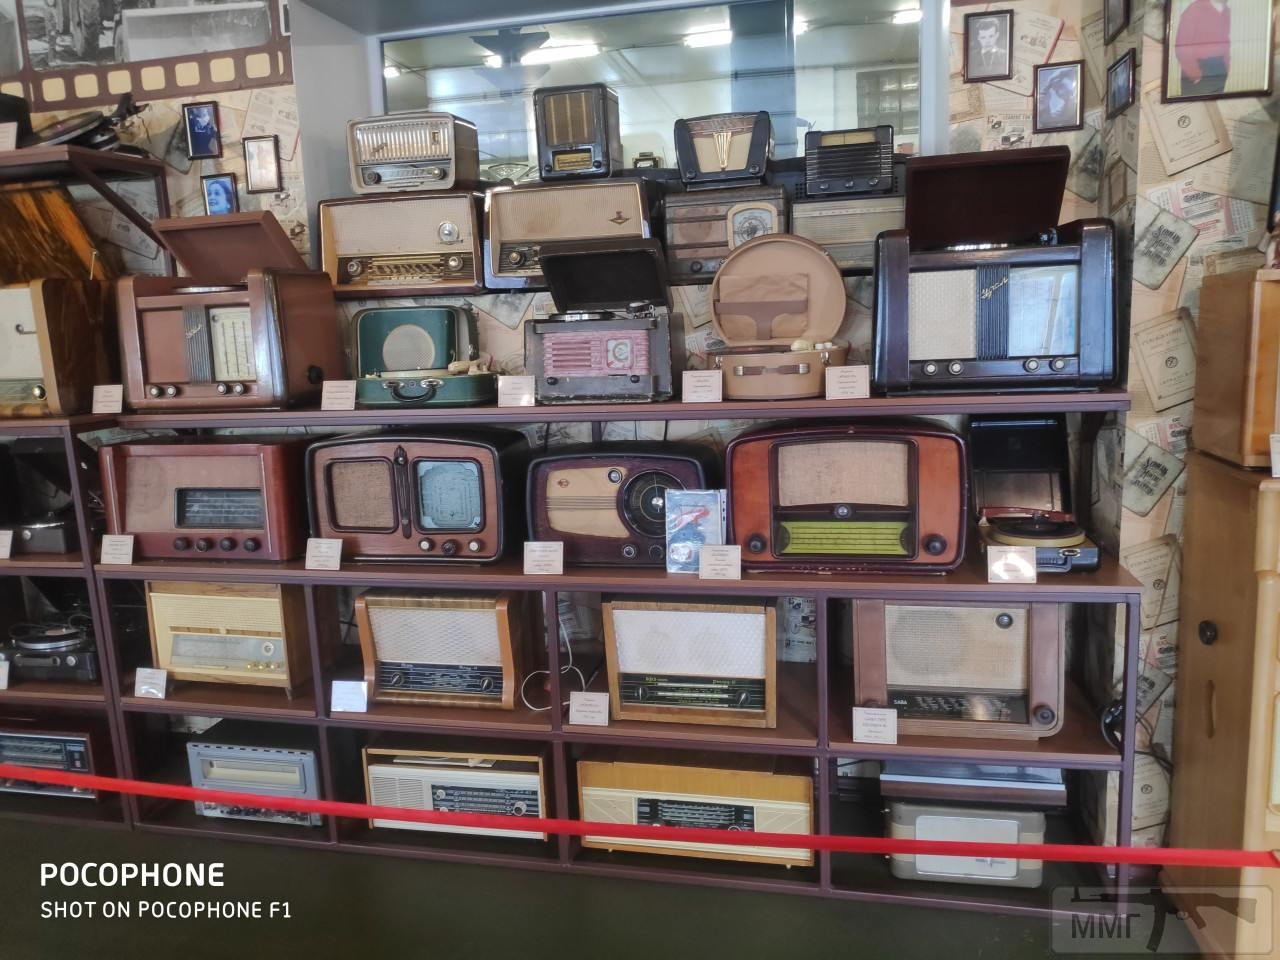 71129 - Музей техники Фаэтон в г. Запорожье